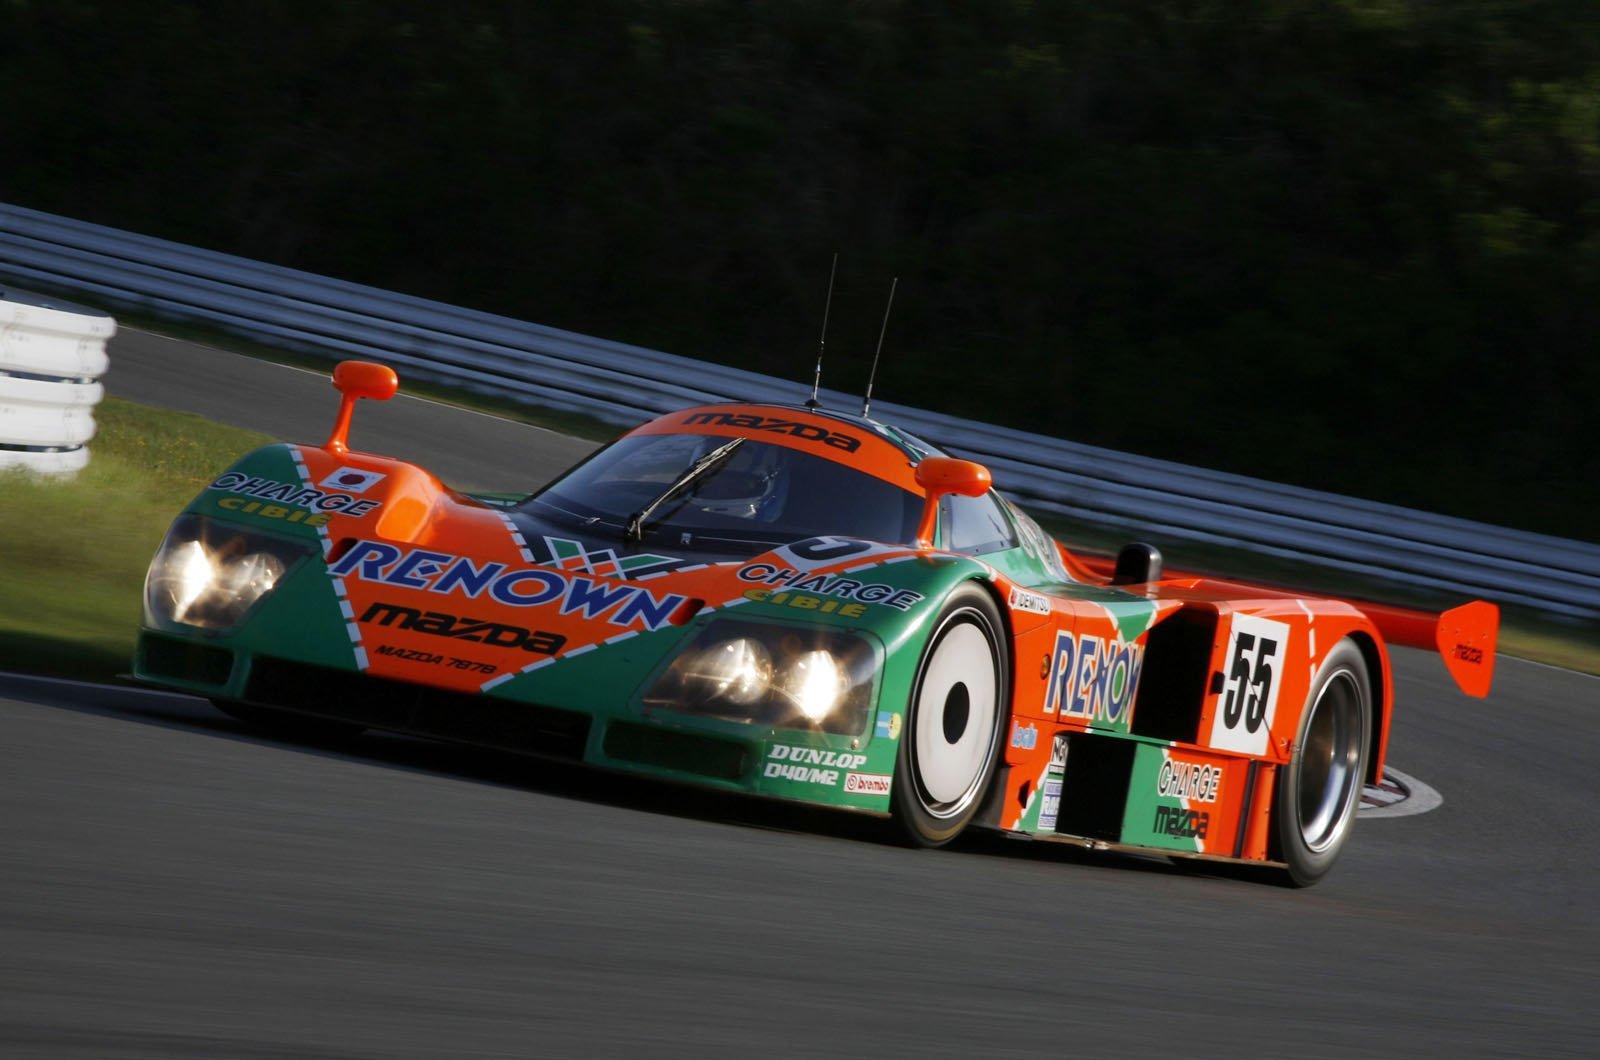 Mazda 787B Le Mans winner